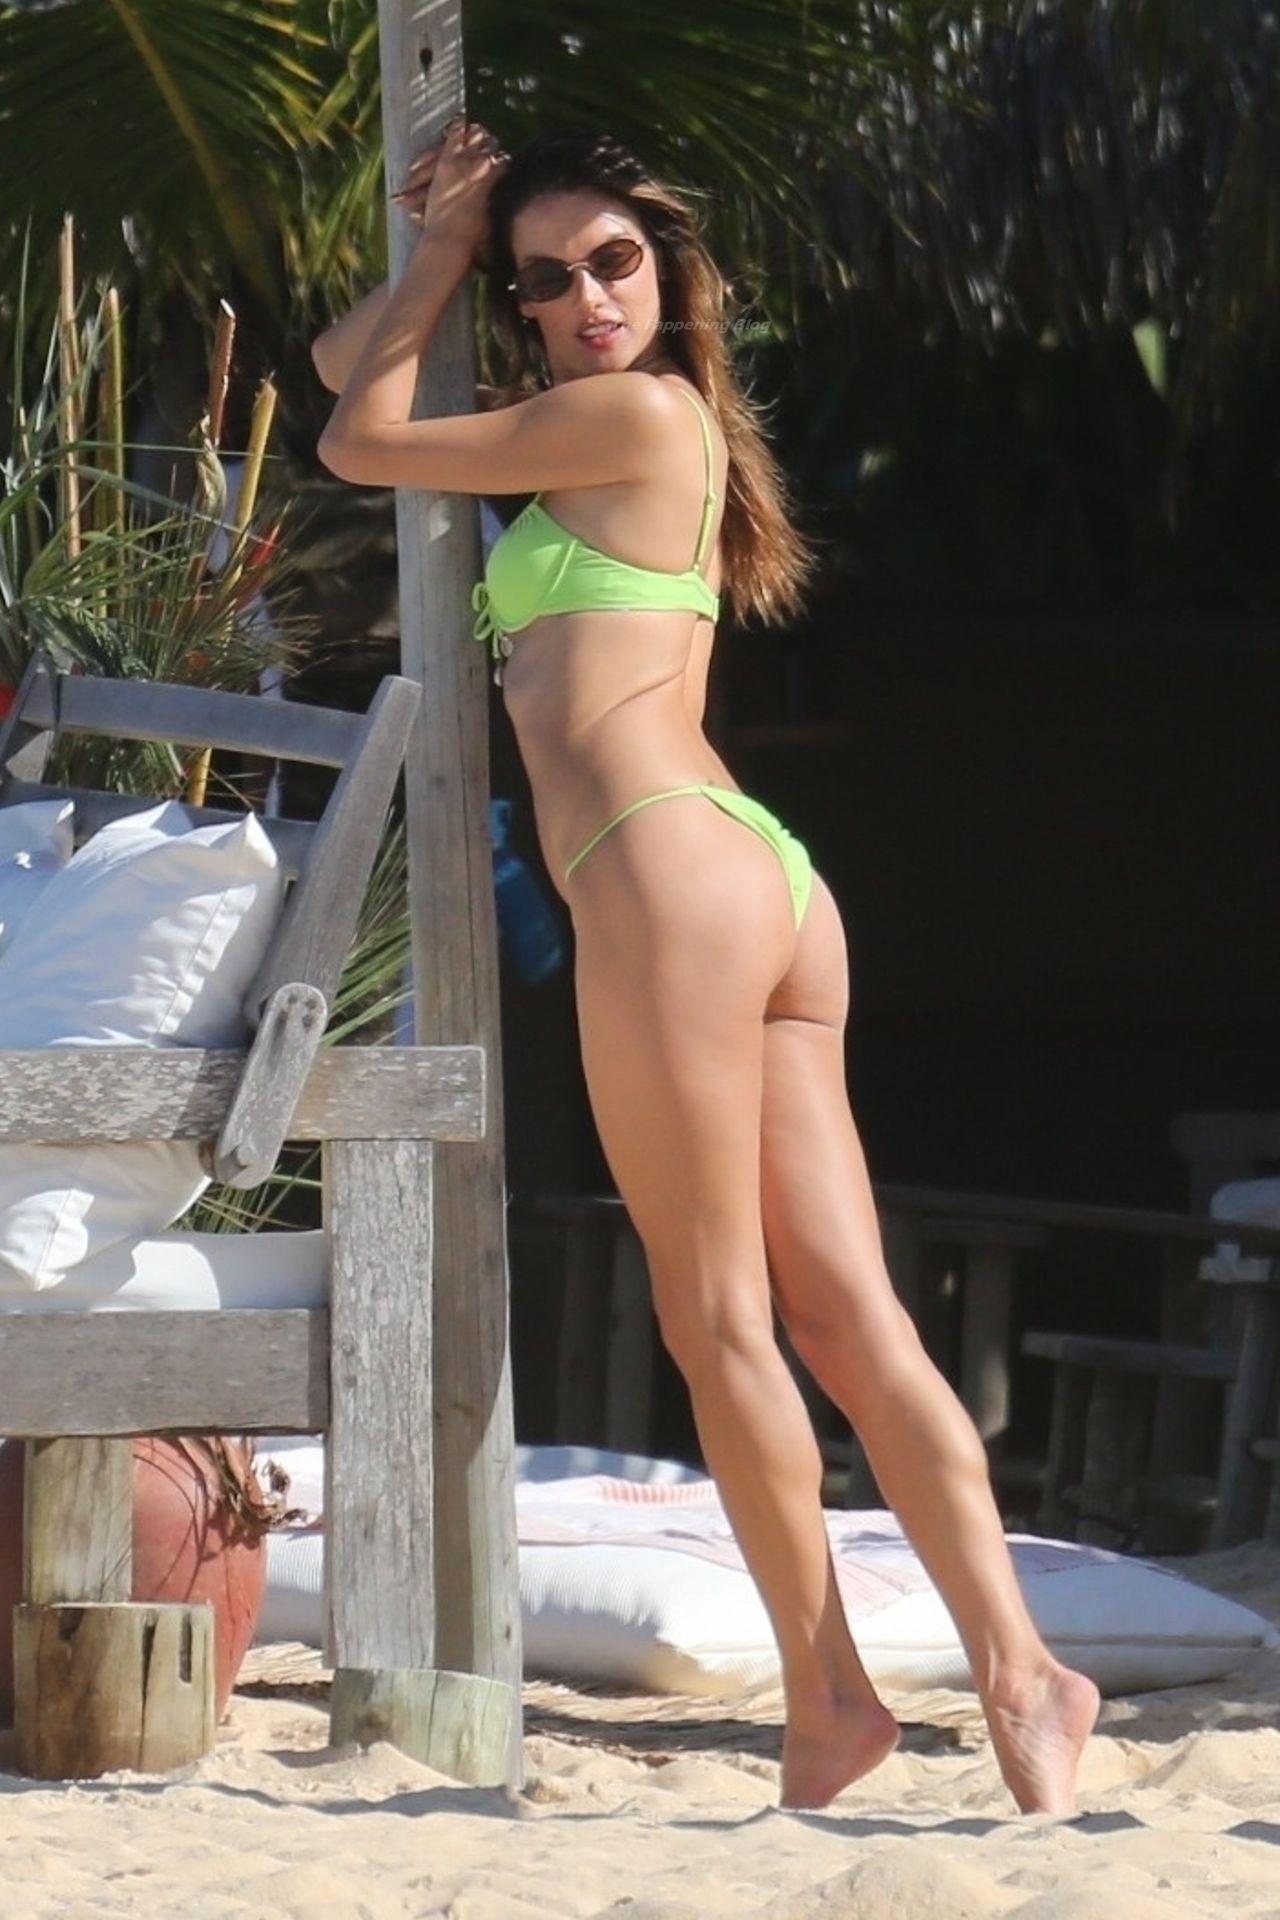 Alessandra-Ambrosio-Sexy-The-Fappening-Blog-1011.jpg